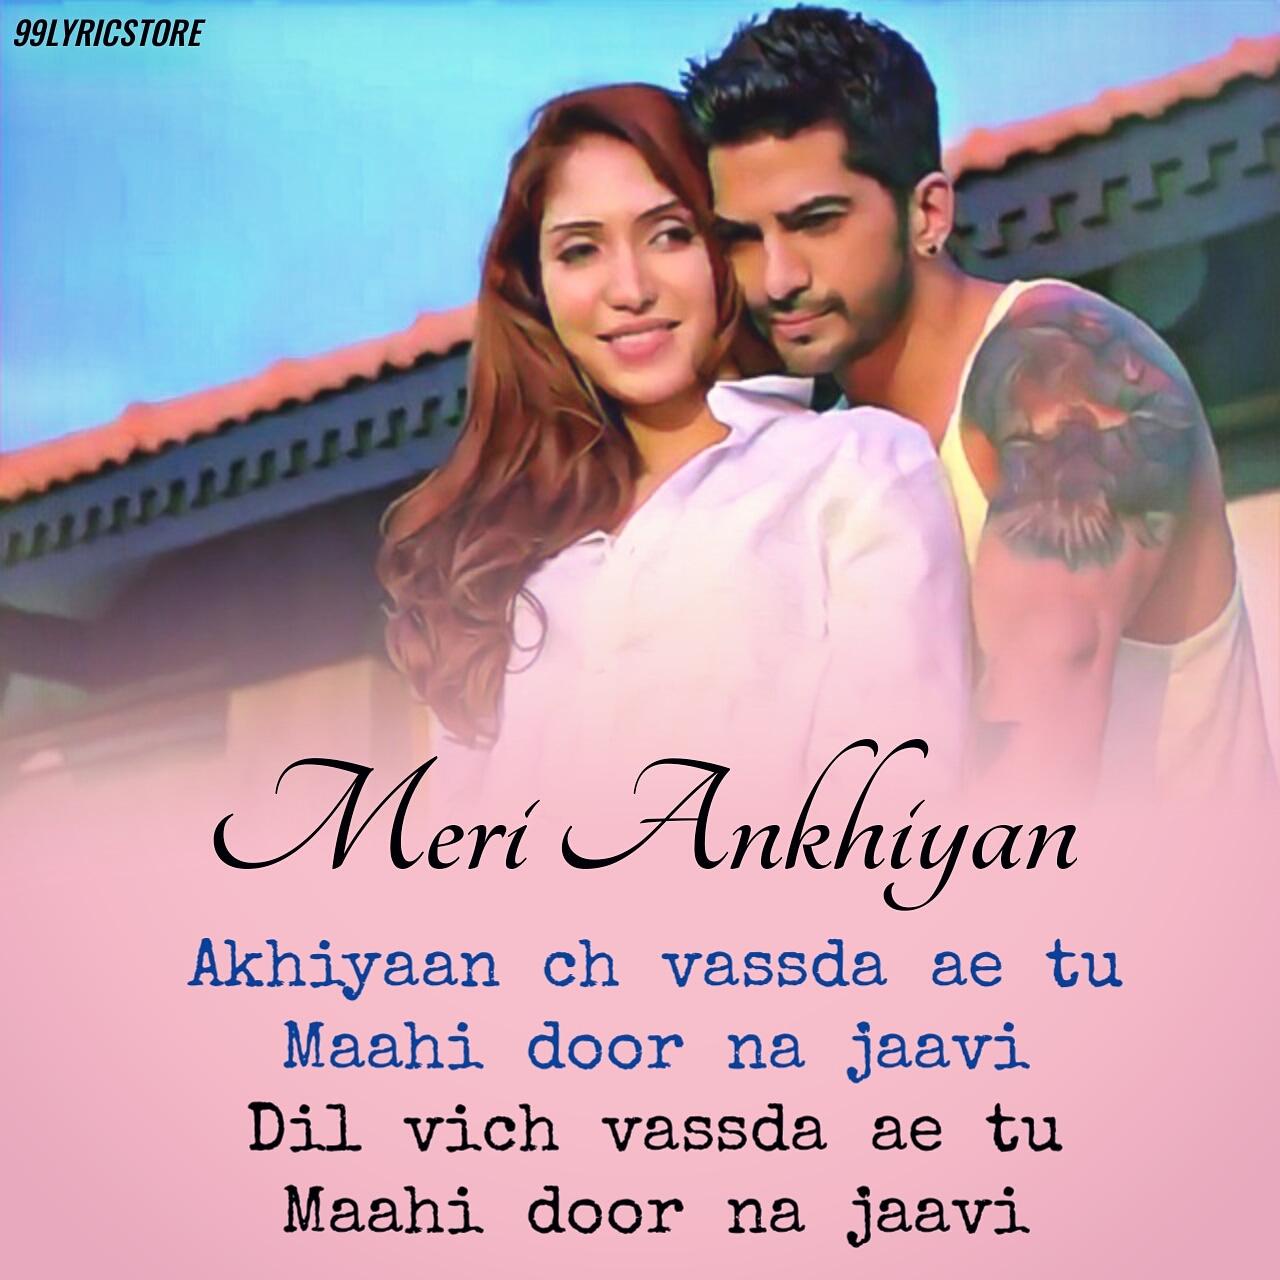 Meri Ankhiyan Punjabi Lyrics sung by Amit Tondon